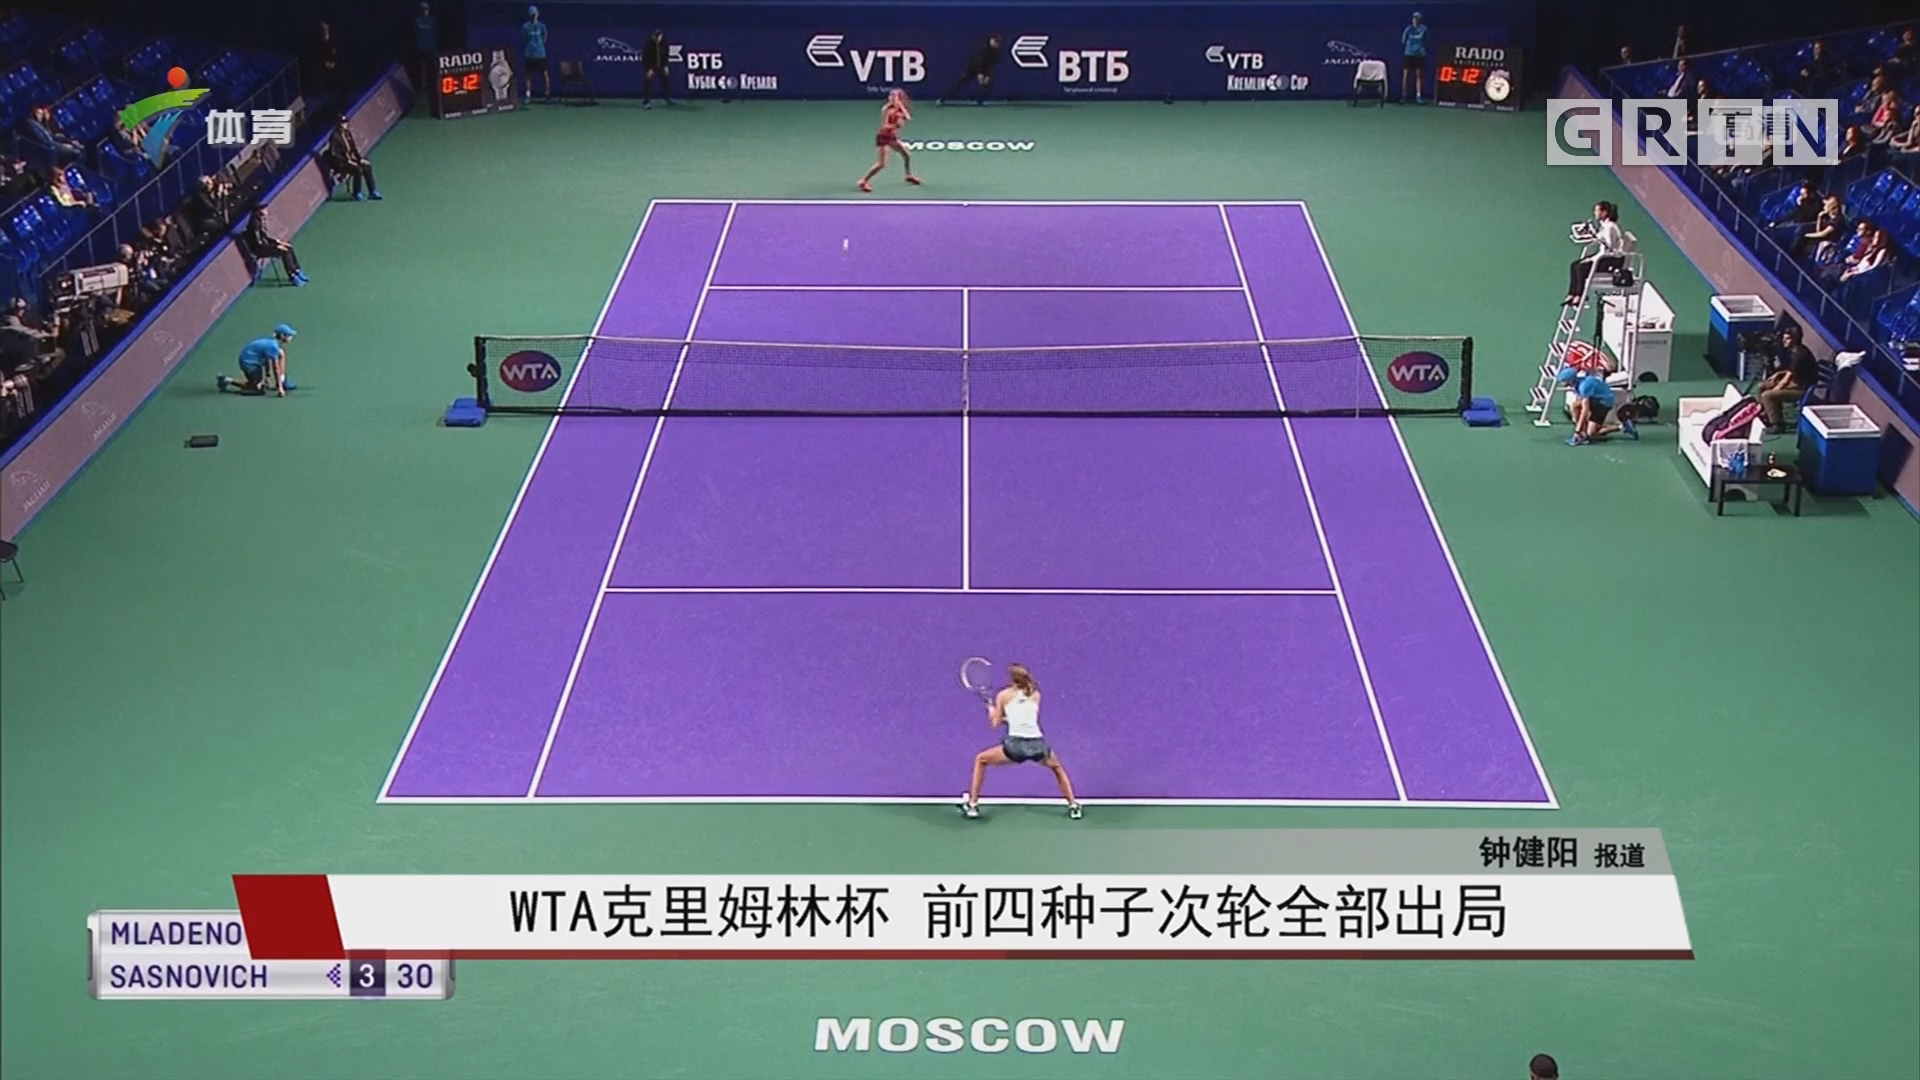 WTA克里姆林杯 前四种子次轮全部出局